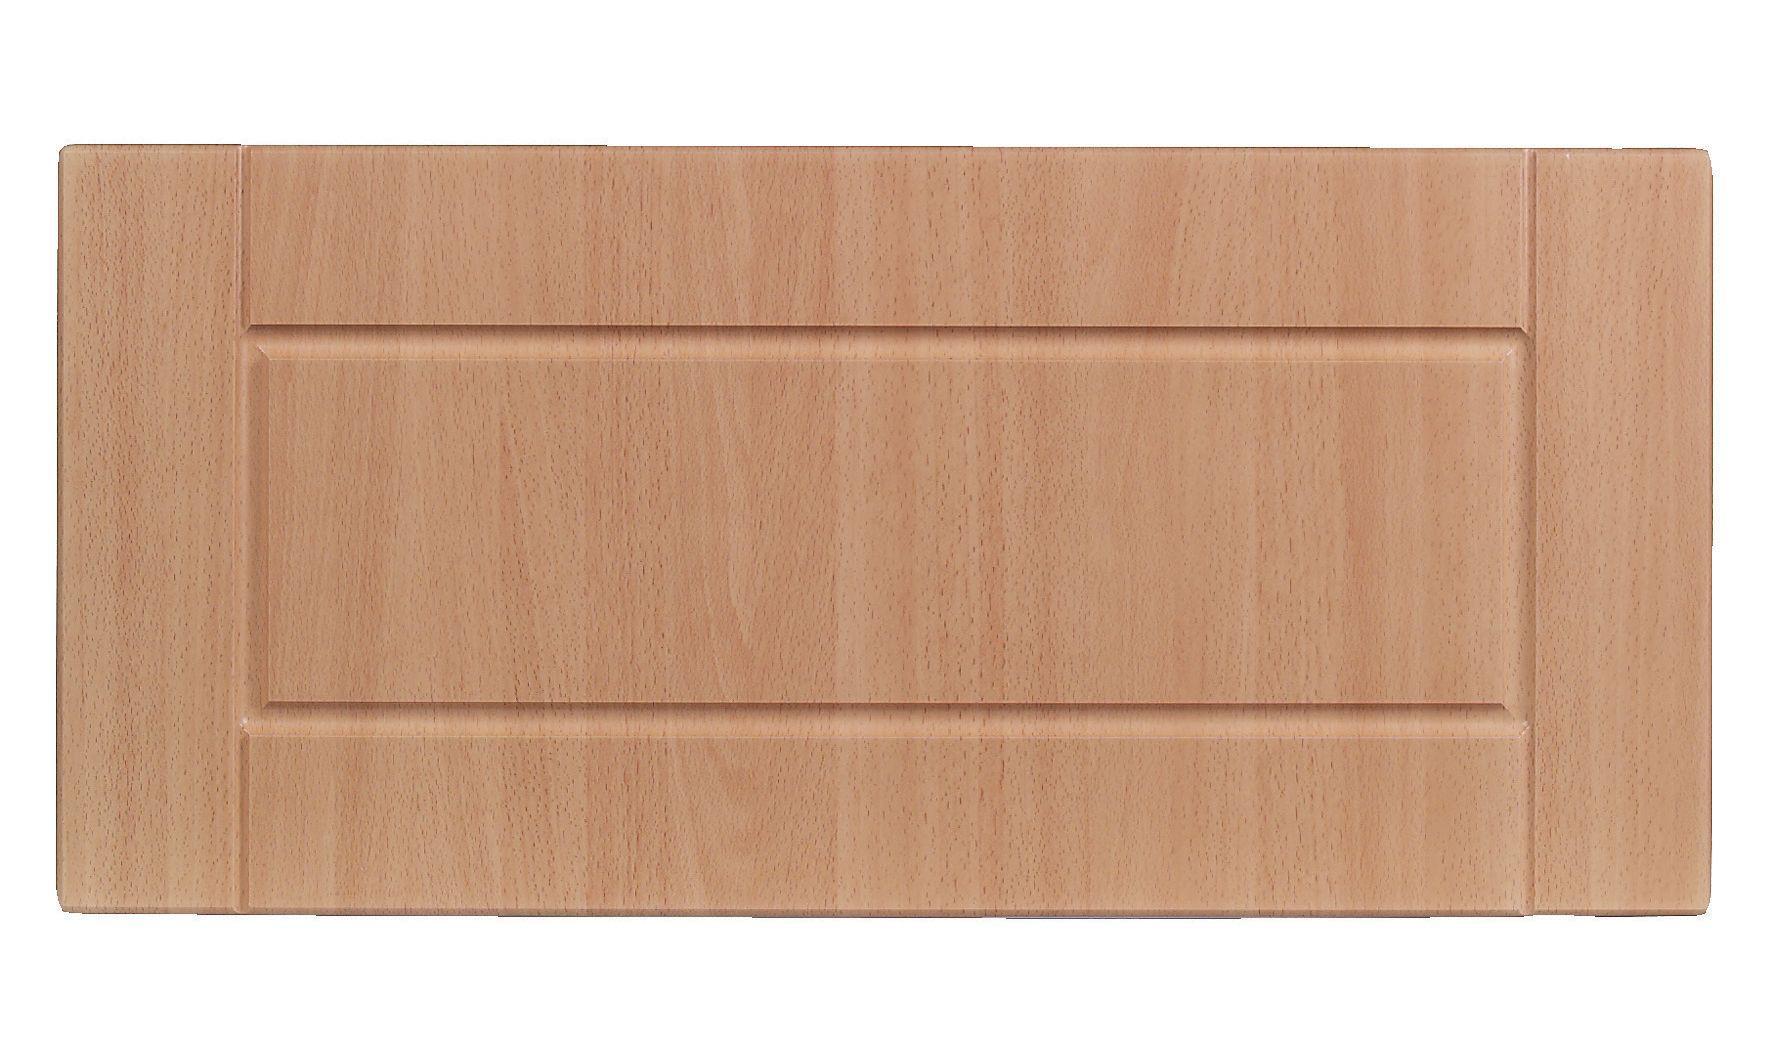 It kitchens chilton beech effect bridging door w 600mm for Kitchen bridging units 600mm